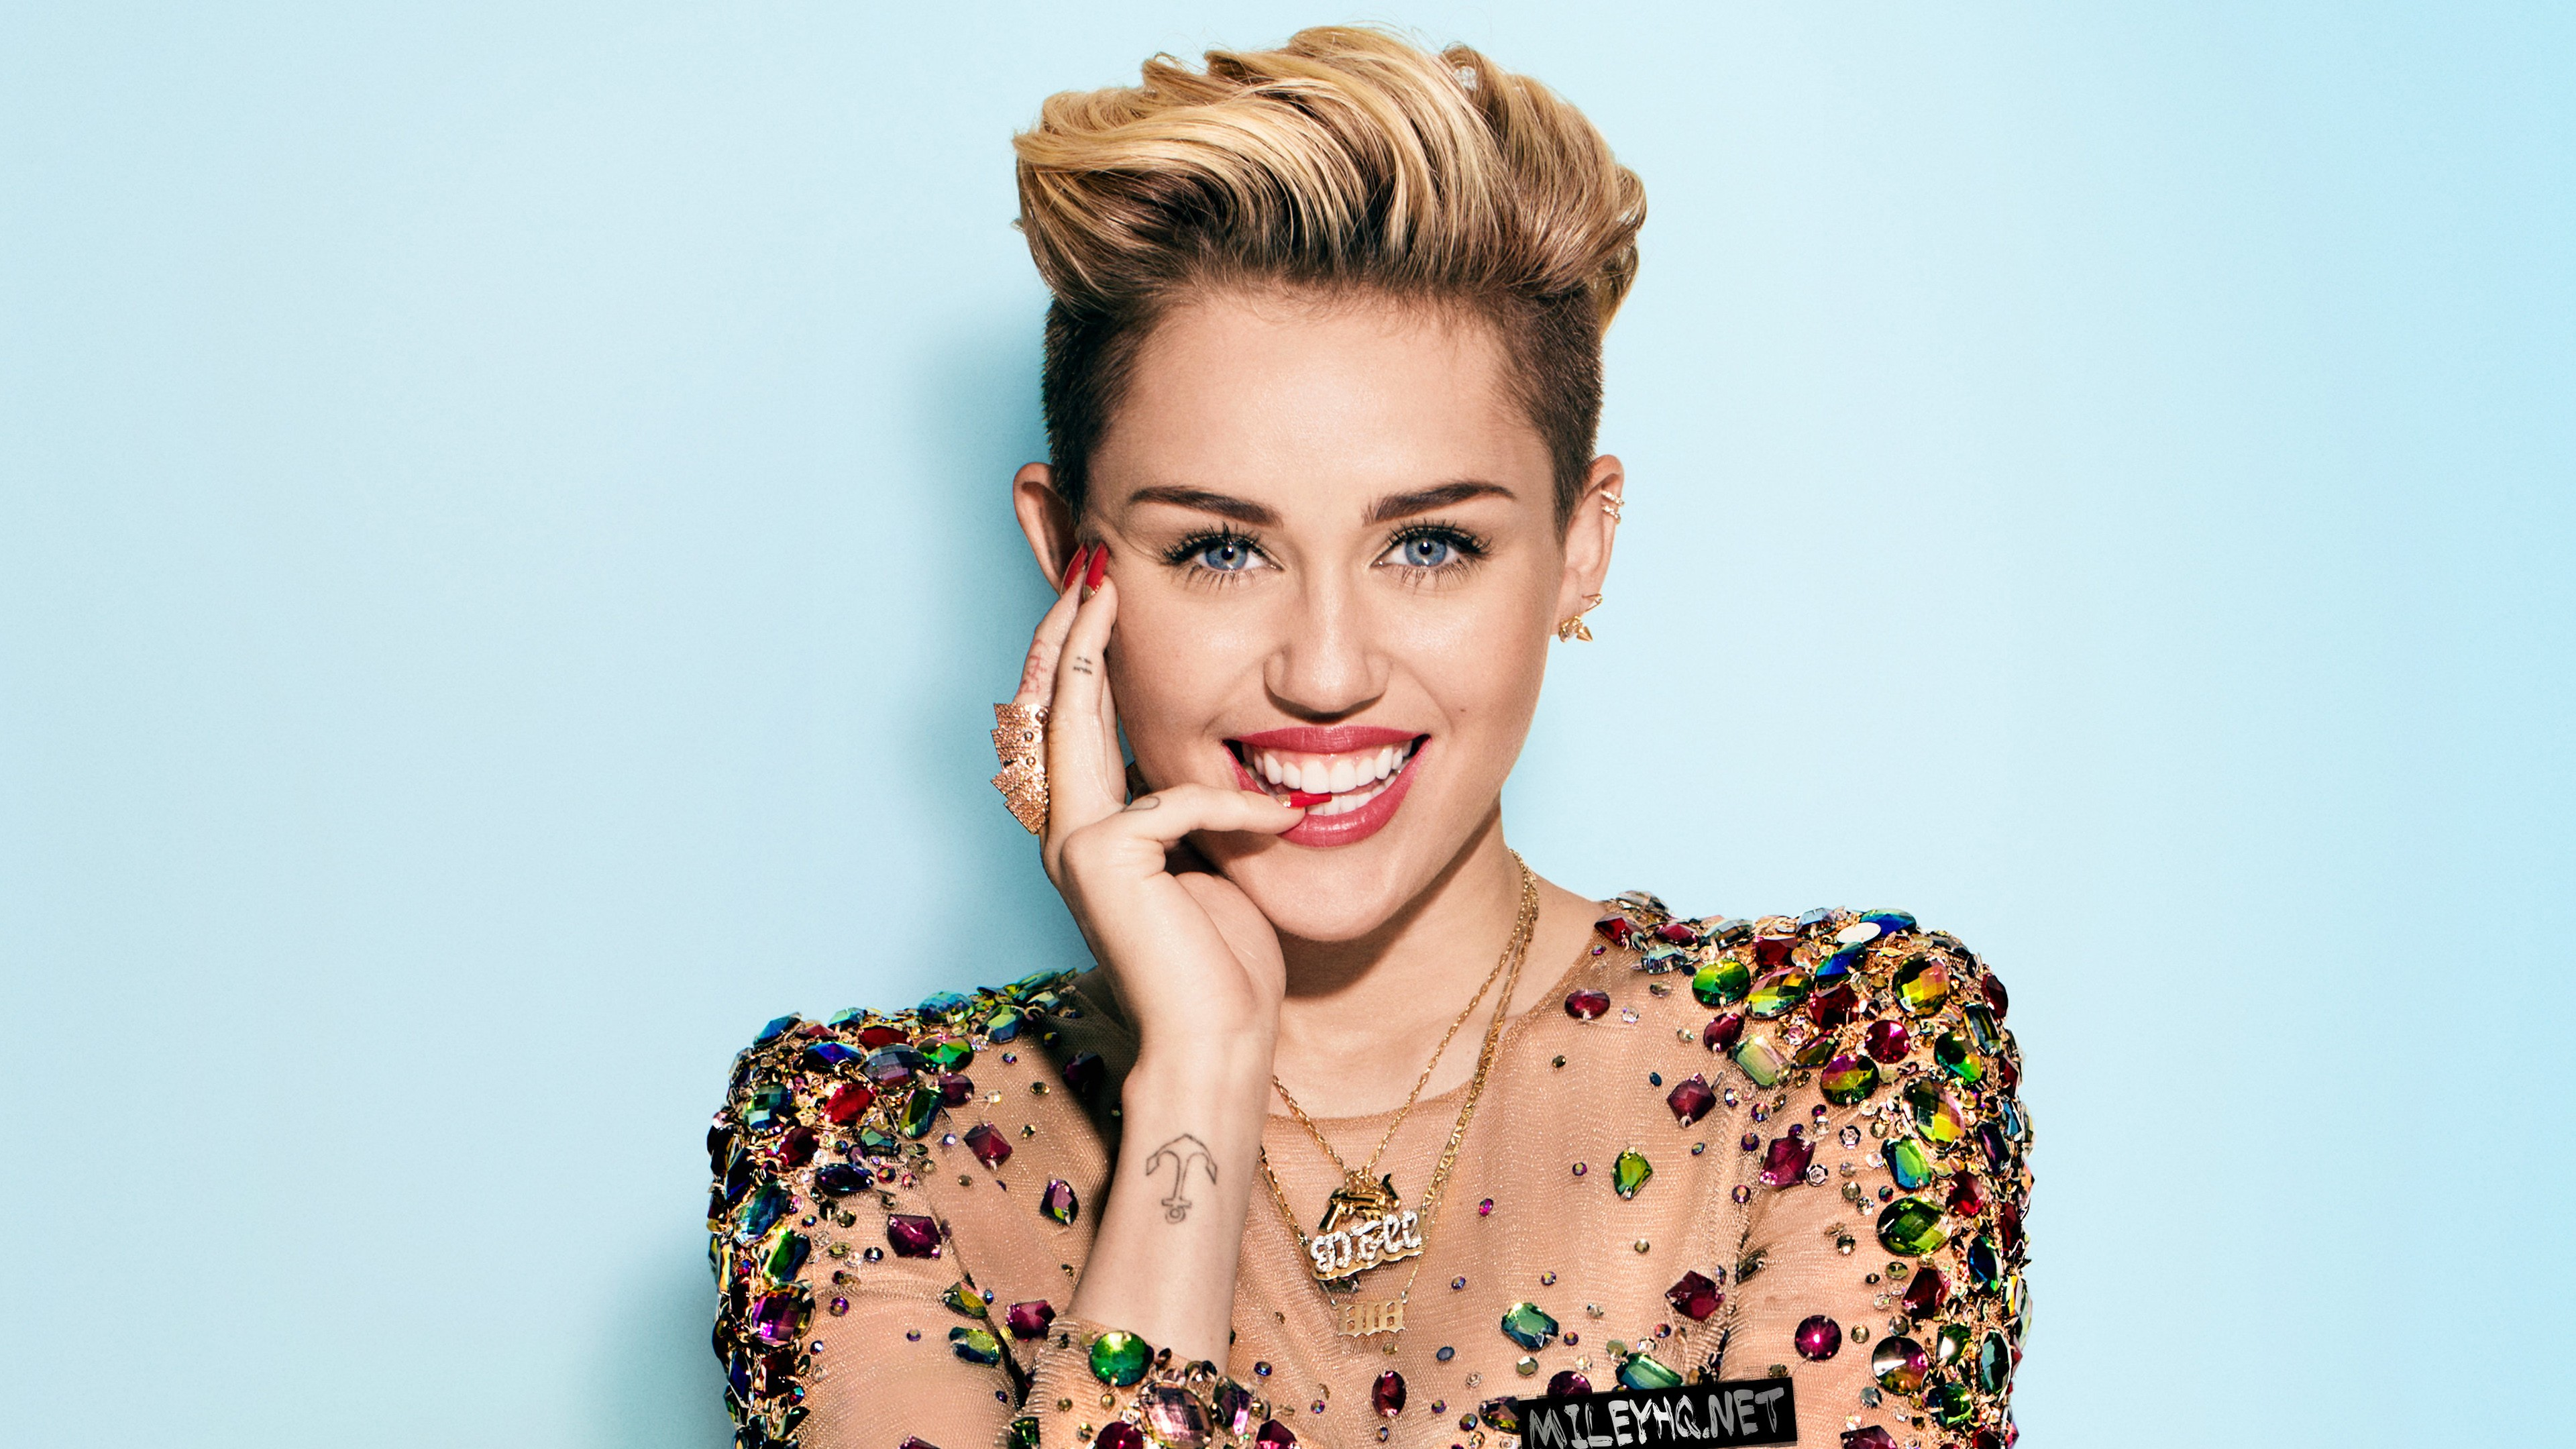 Miley Cyrus 84 HD wallpaper 3840x2160